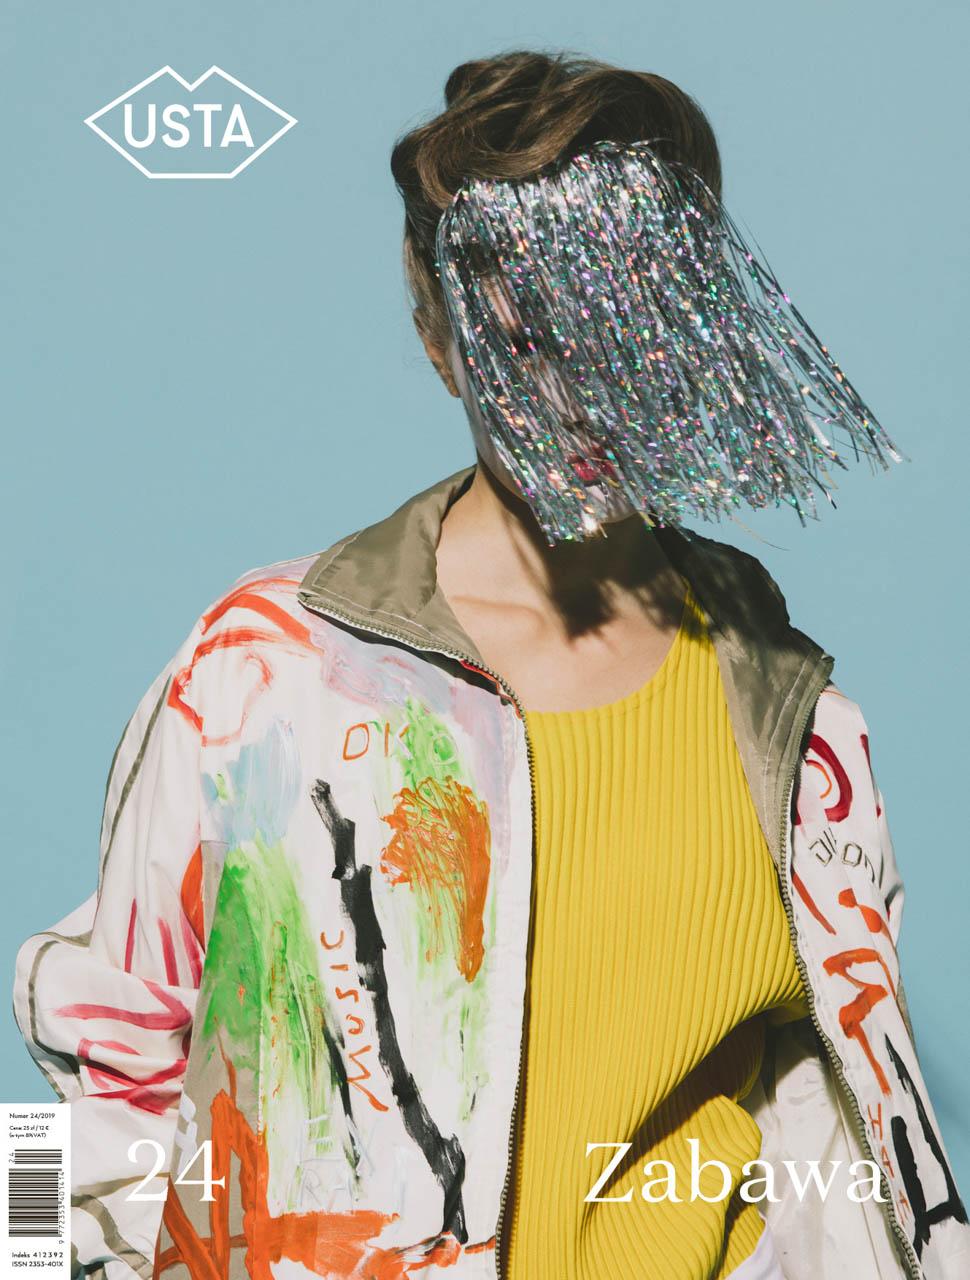 USTA magazine cover